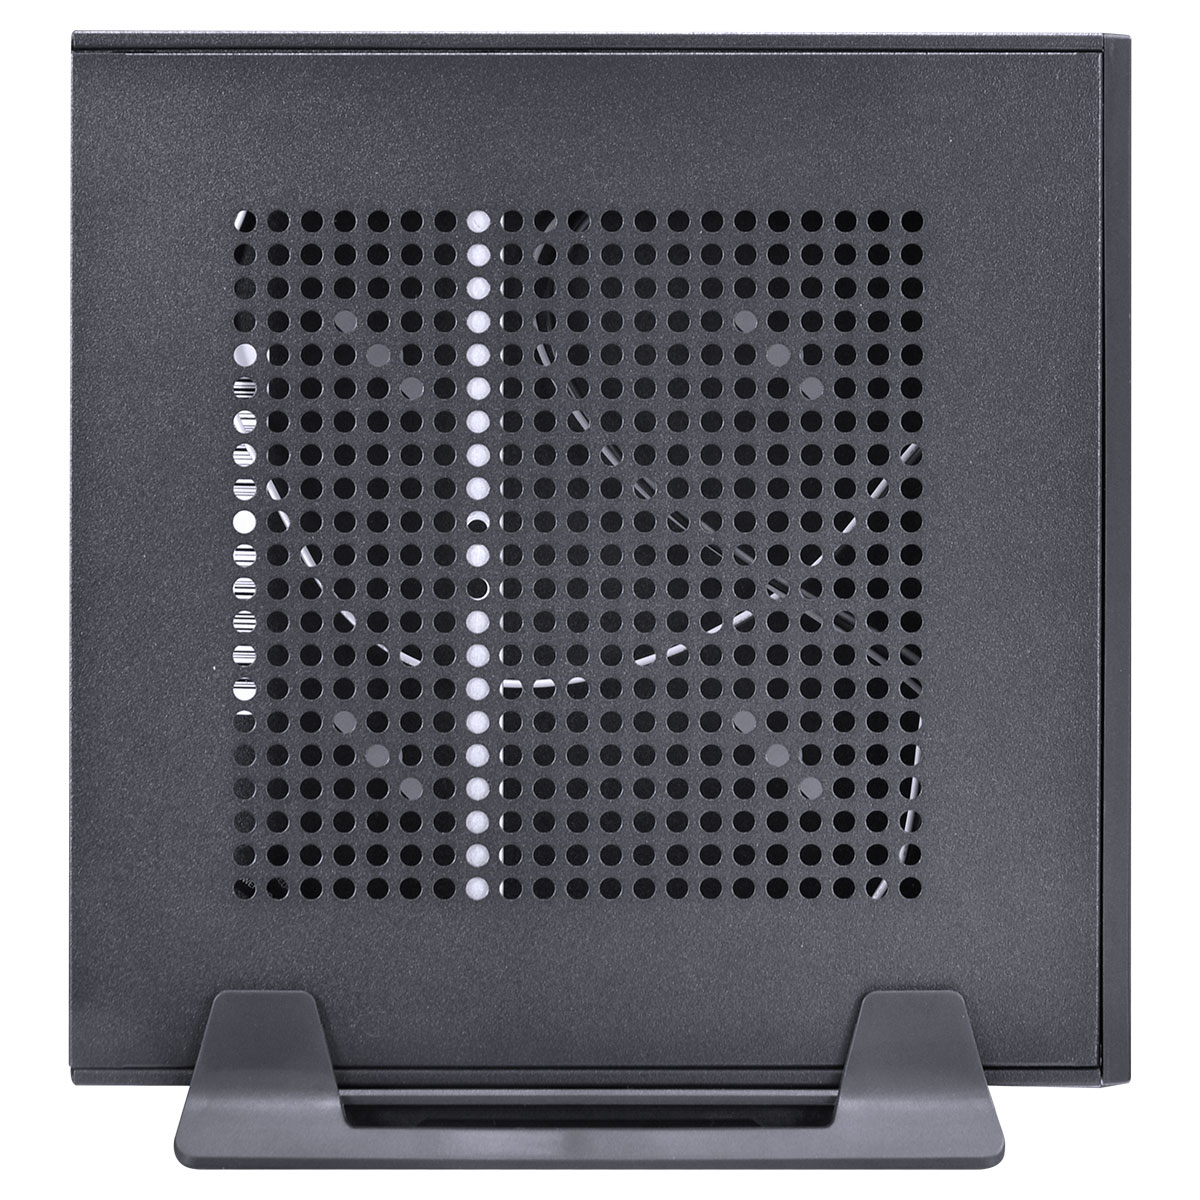 MINI COMPUTADOR BUSINESS B100 - CELERON QUAD CORE J4105 1.50GHZ 8GB DDR4 SODIMM SSD 120GB PORTA SERIAL FONTE EXT.60W